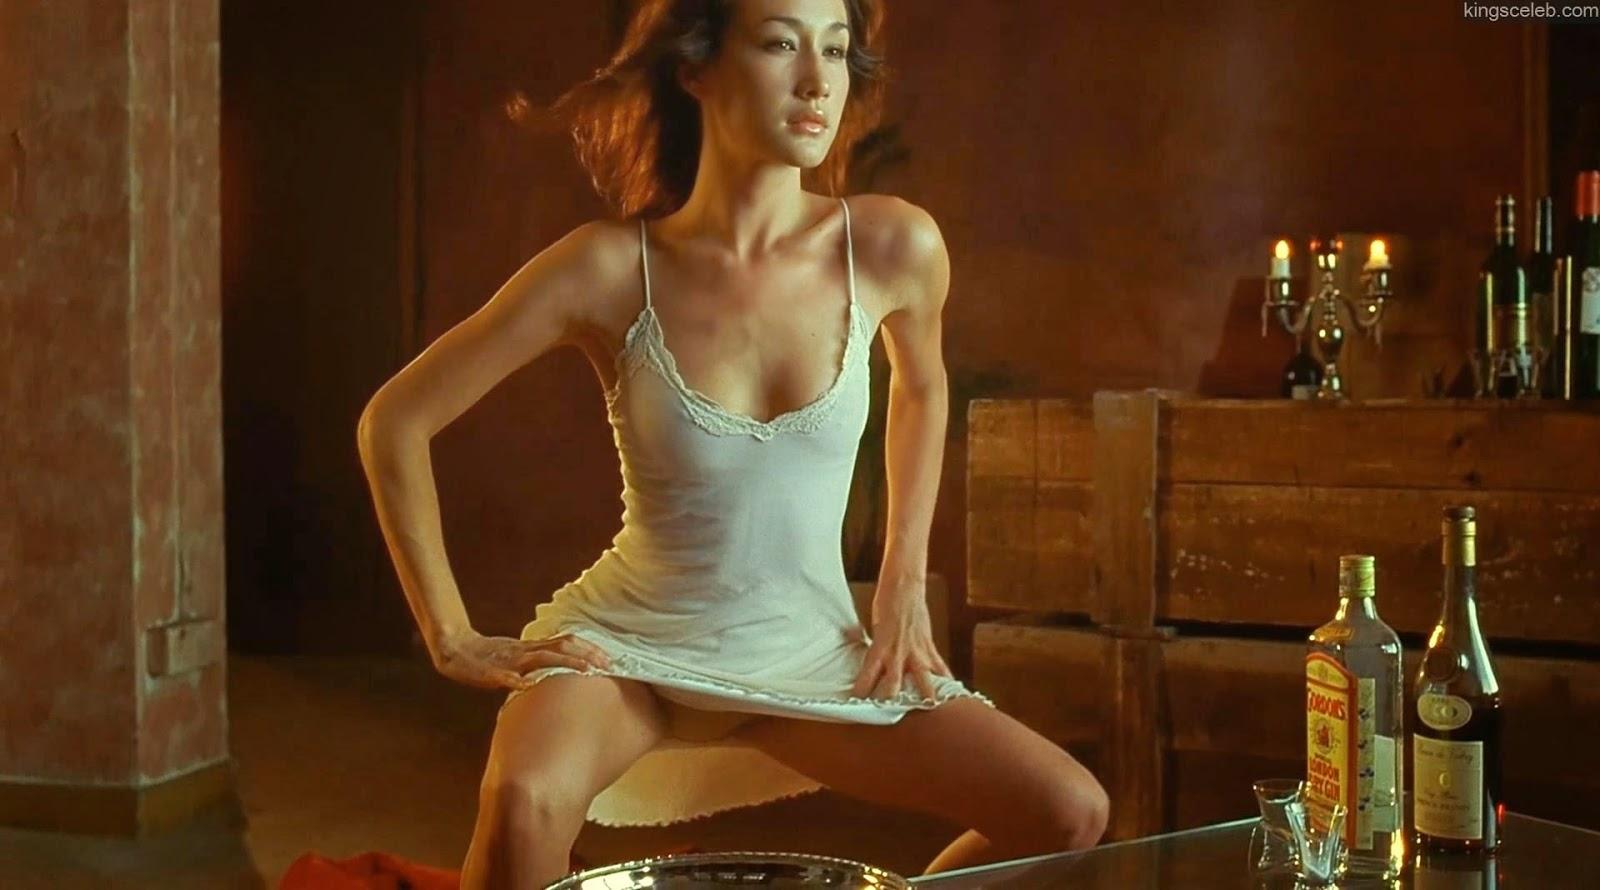 Almen Wong Nude free hd movies download